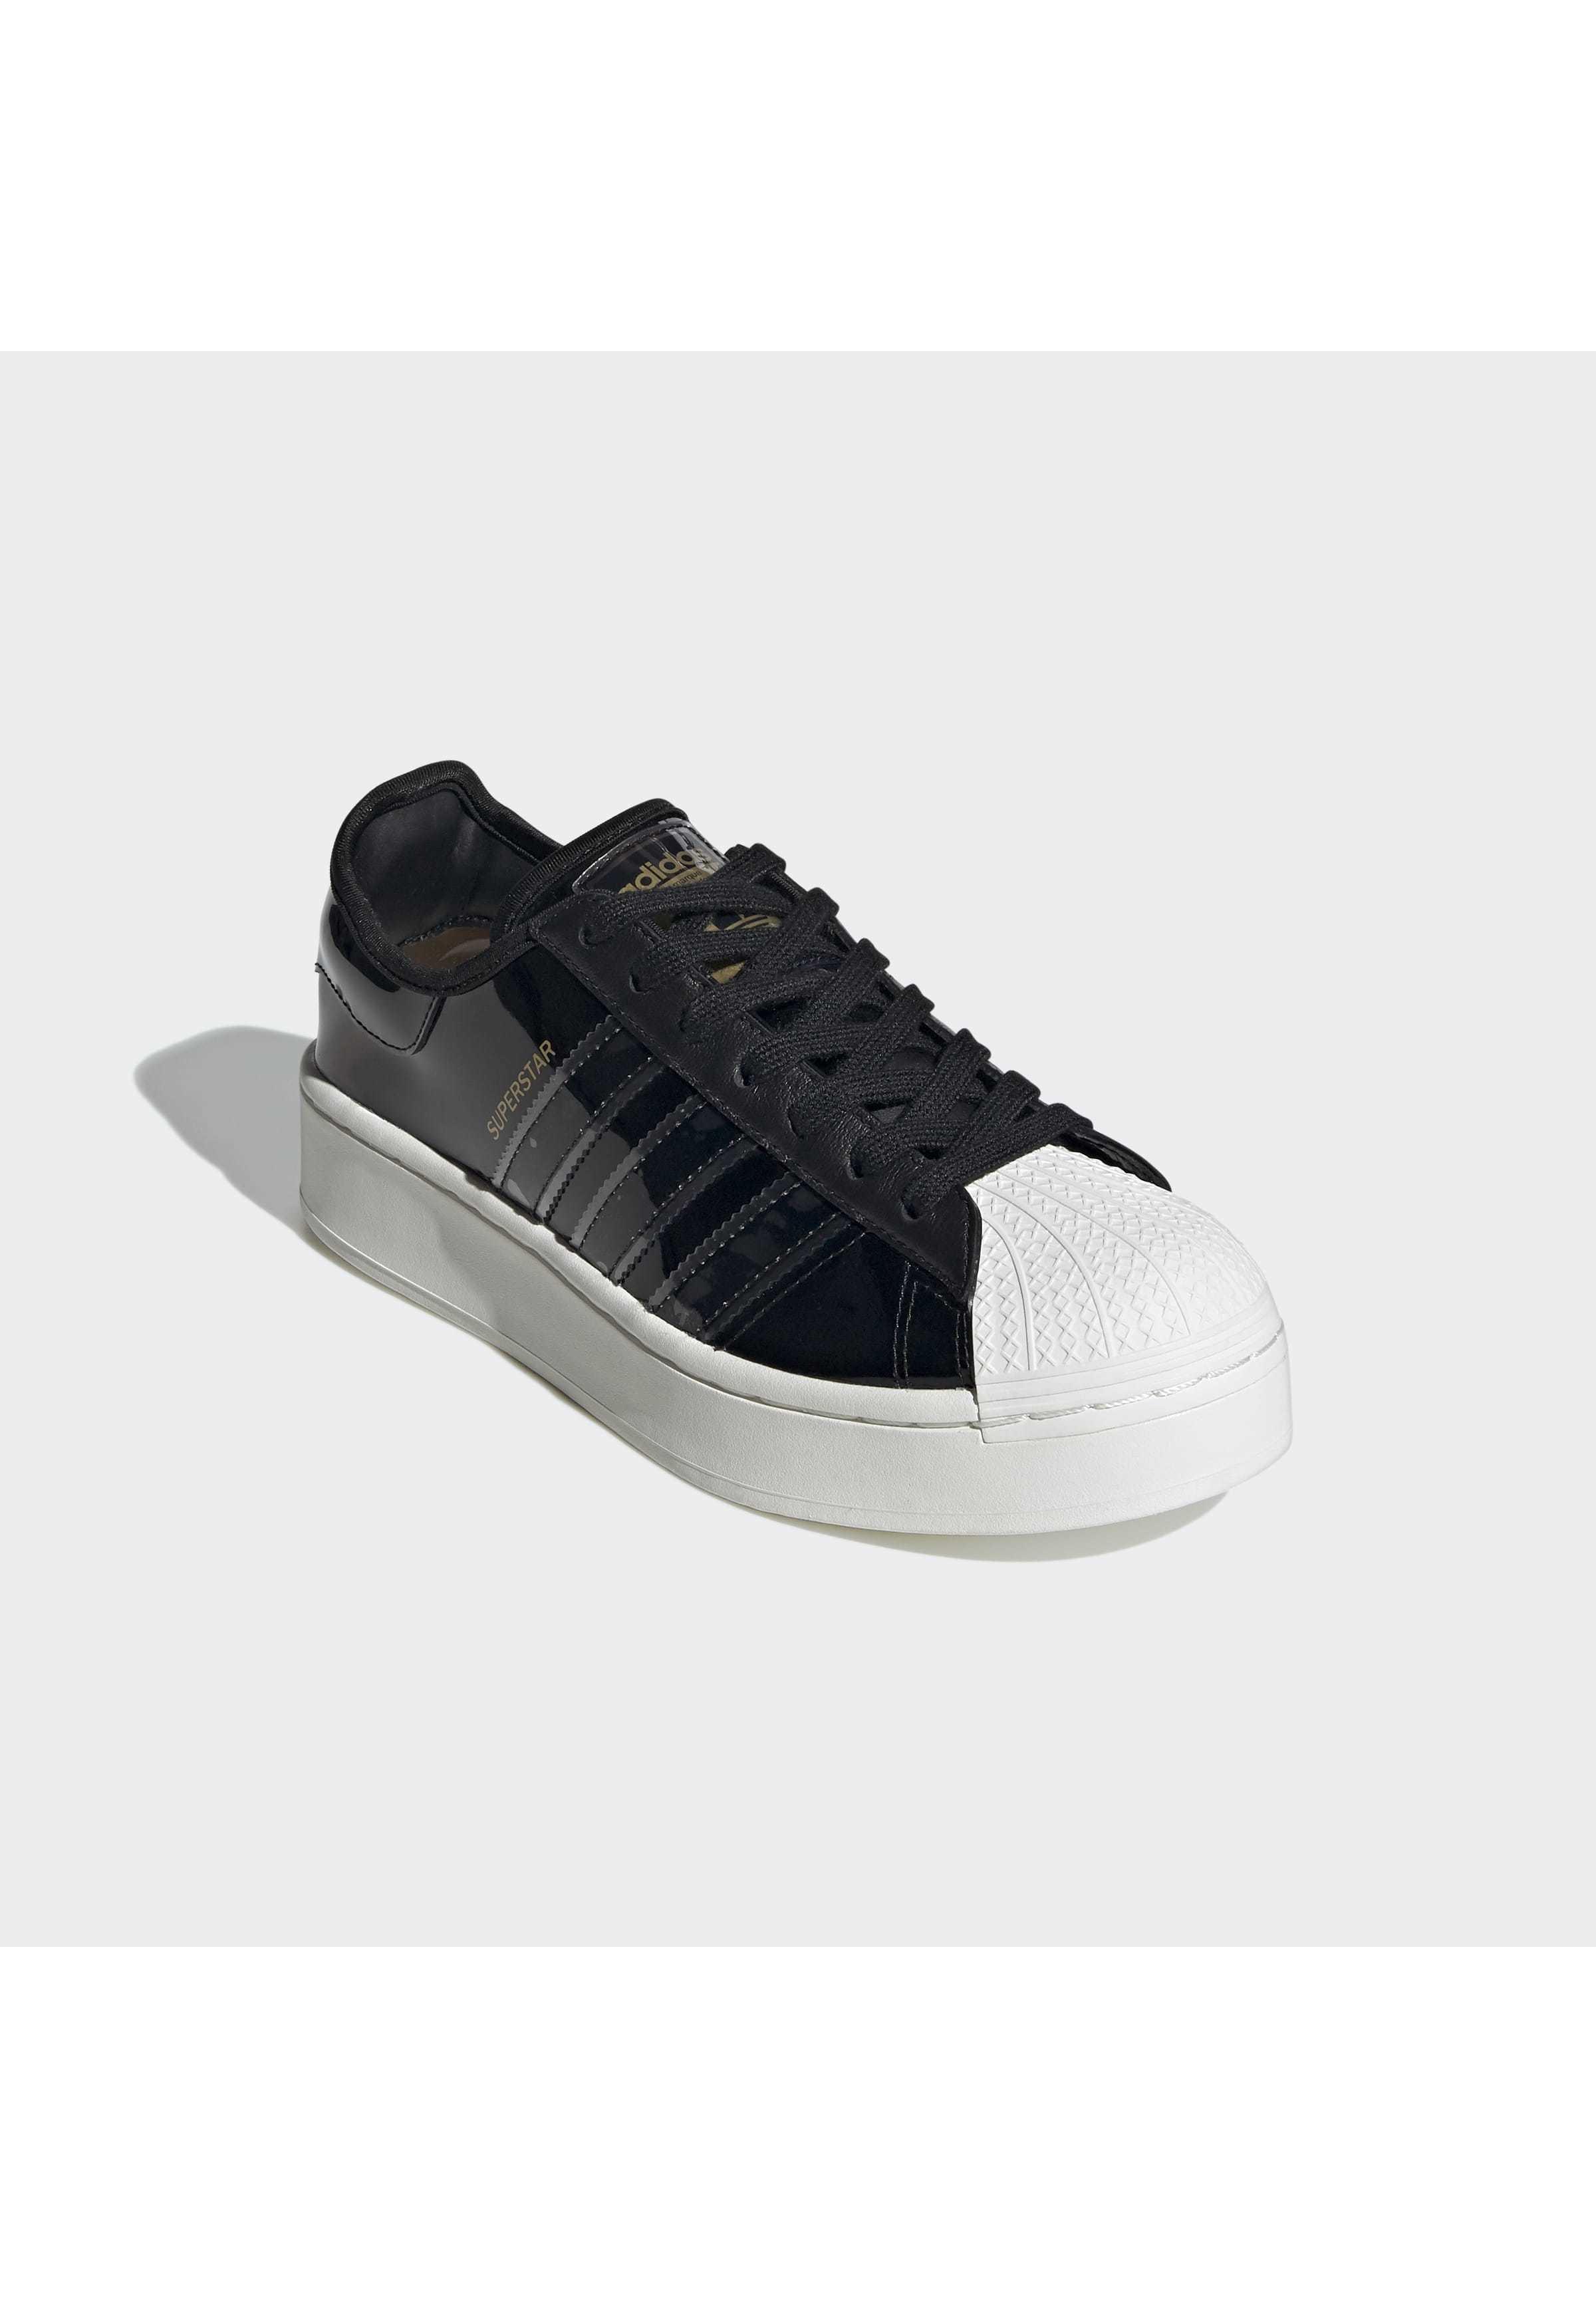 adidas Originals SUPERSTAR BOLD - Sneakers - black